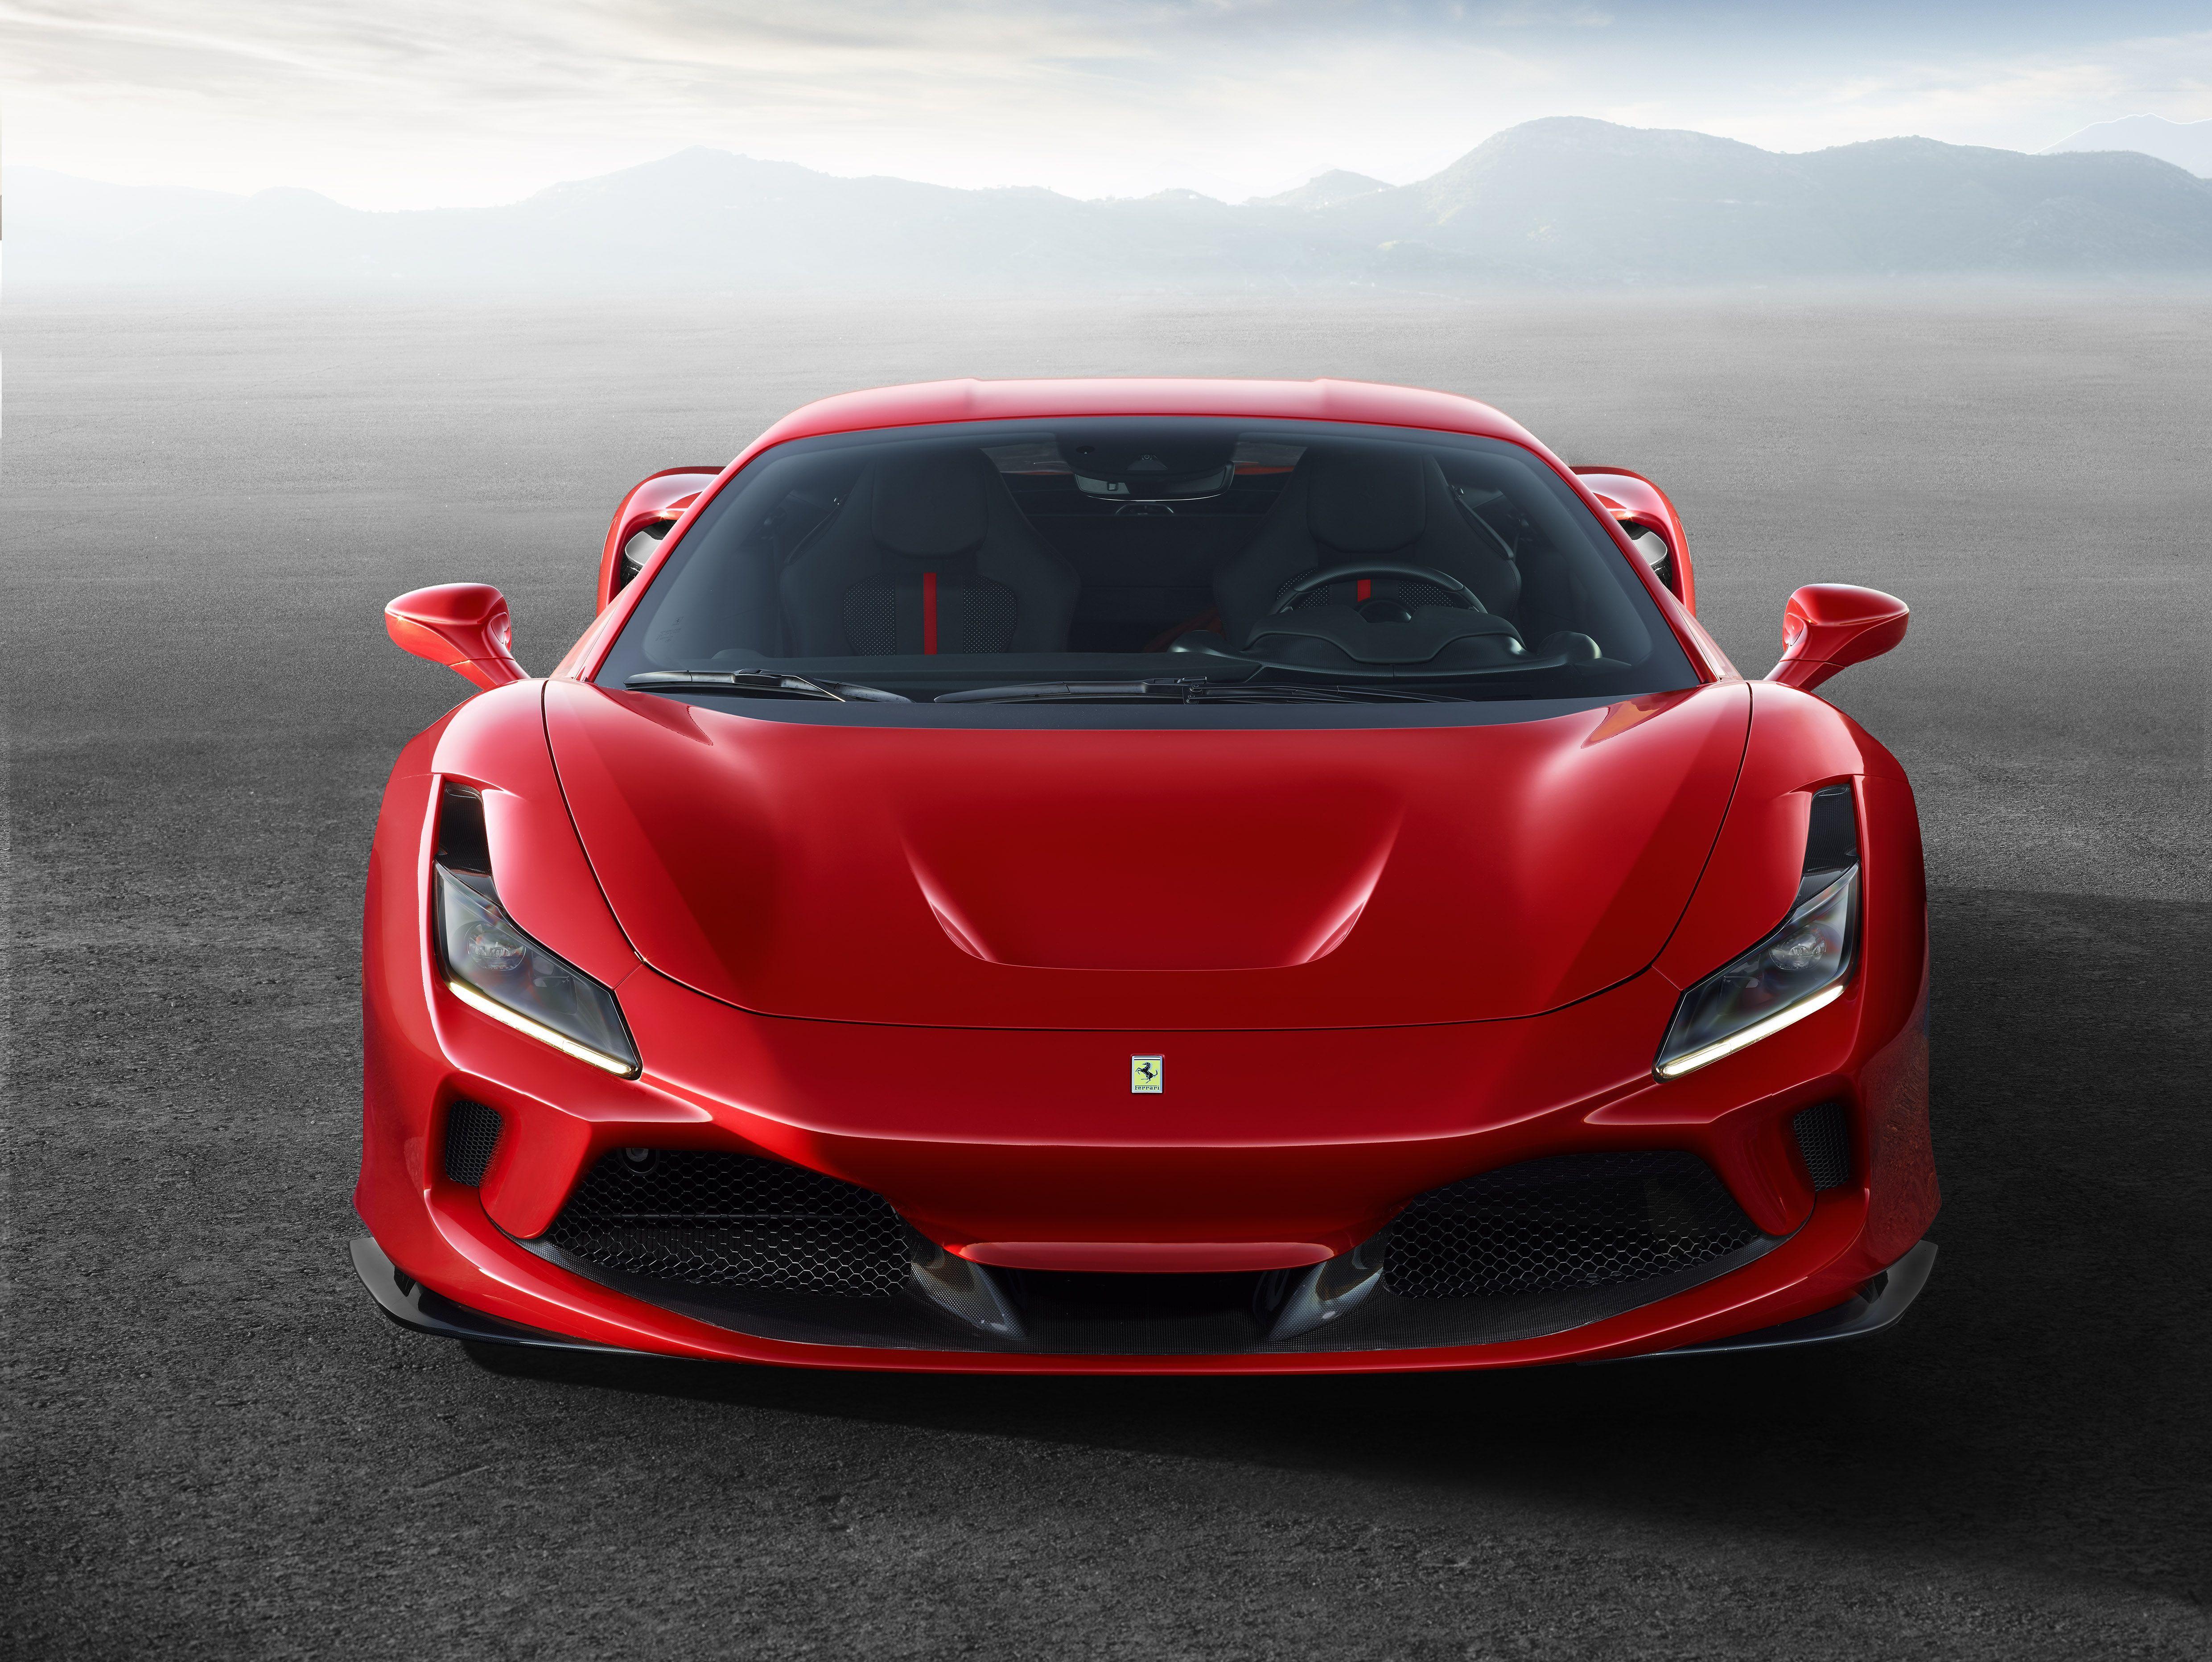 2020 Ferrari F8 Tributo Quirks And Features Sports Car Super